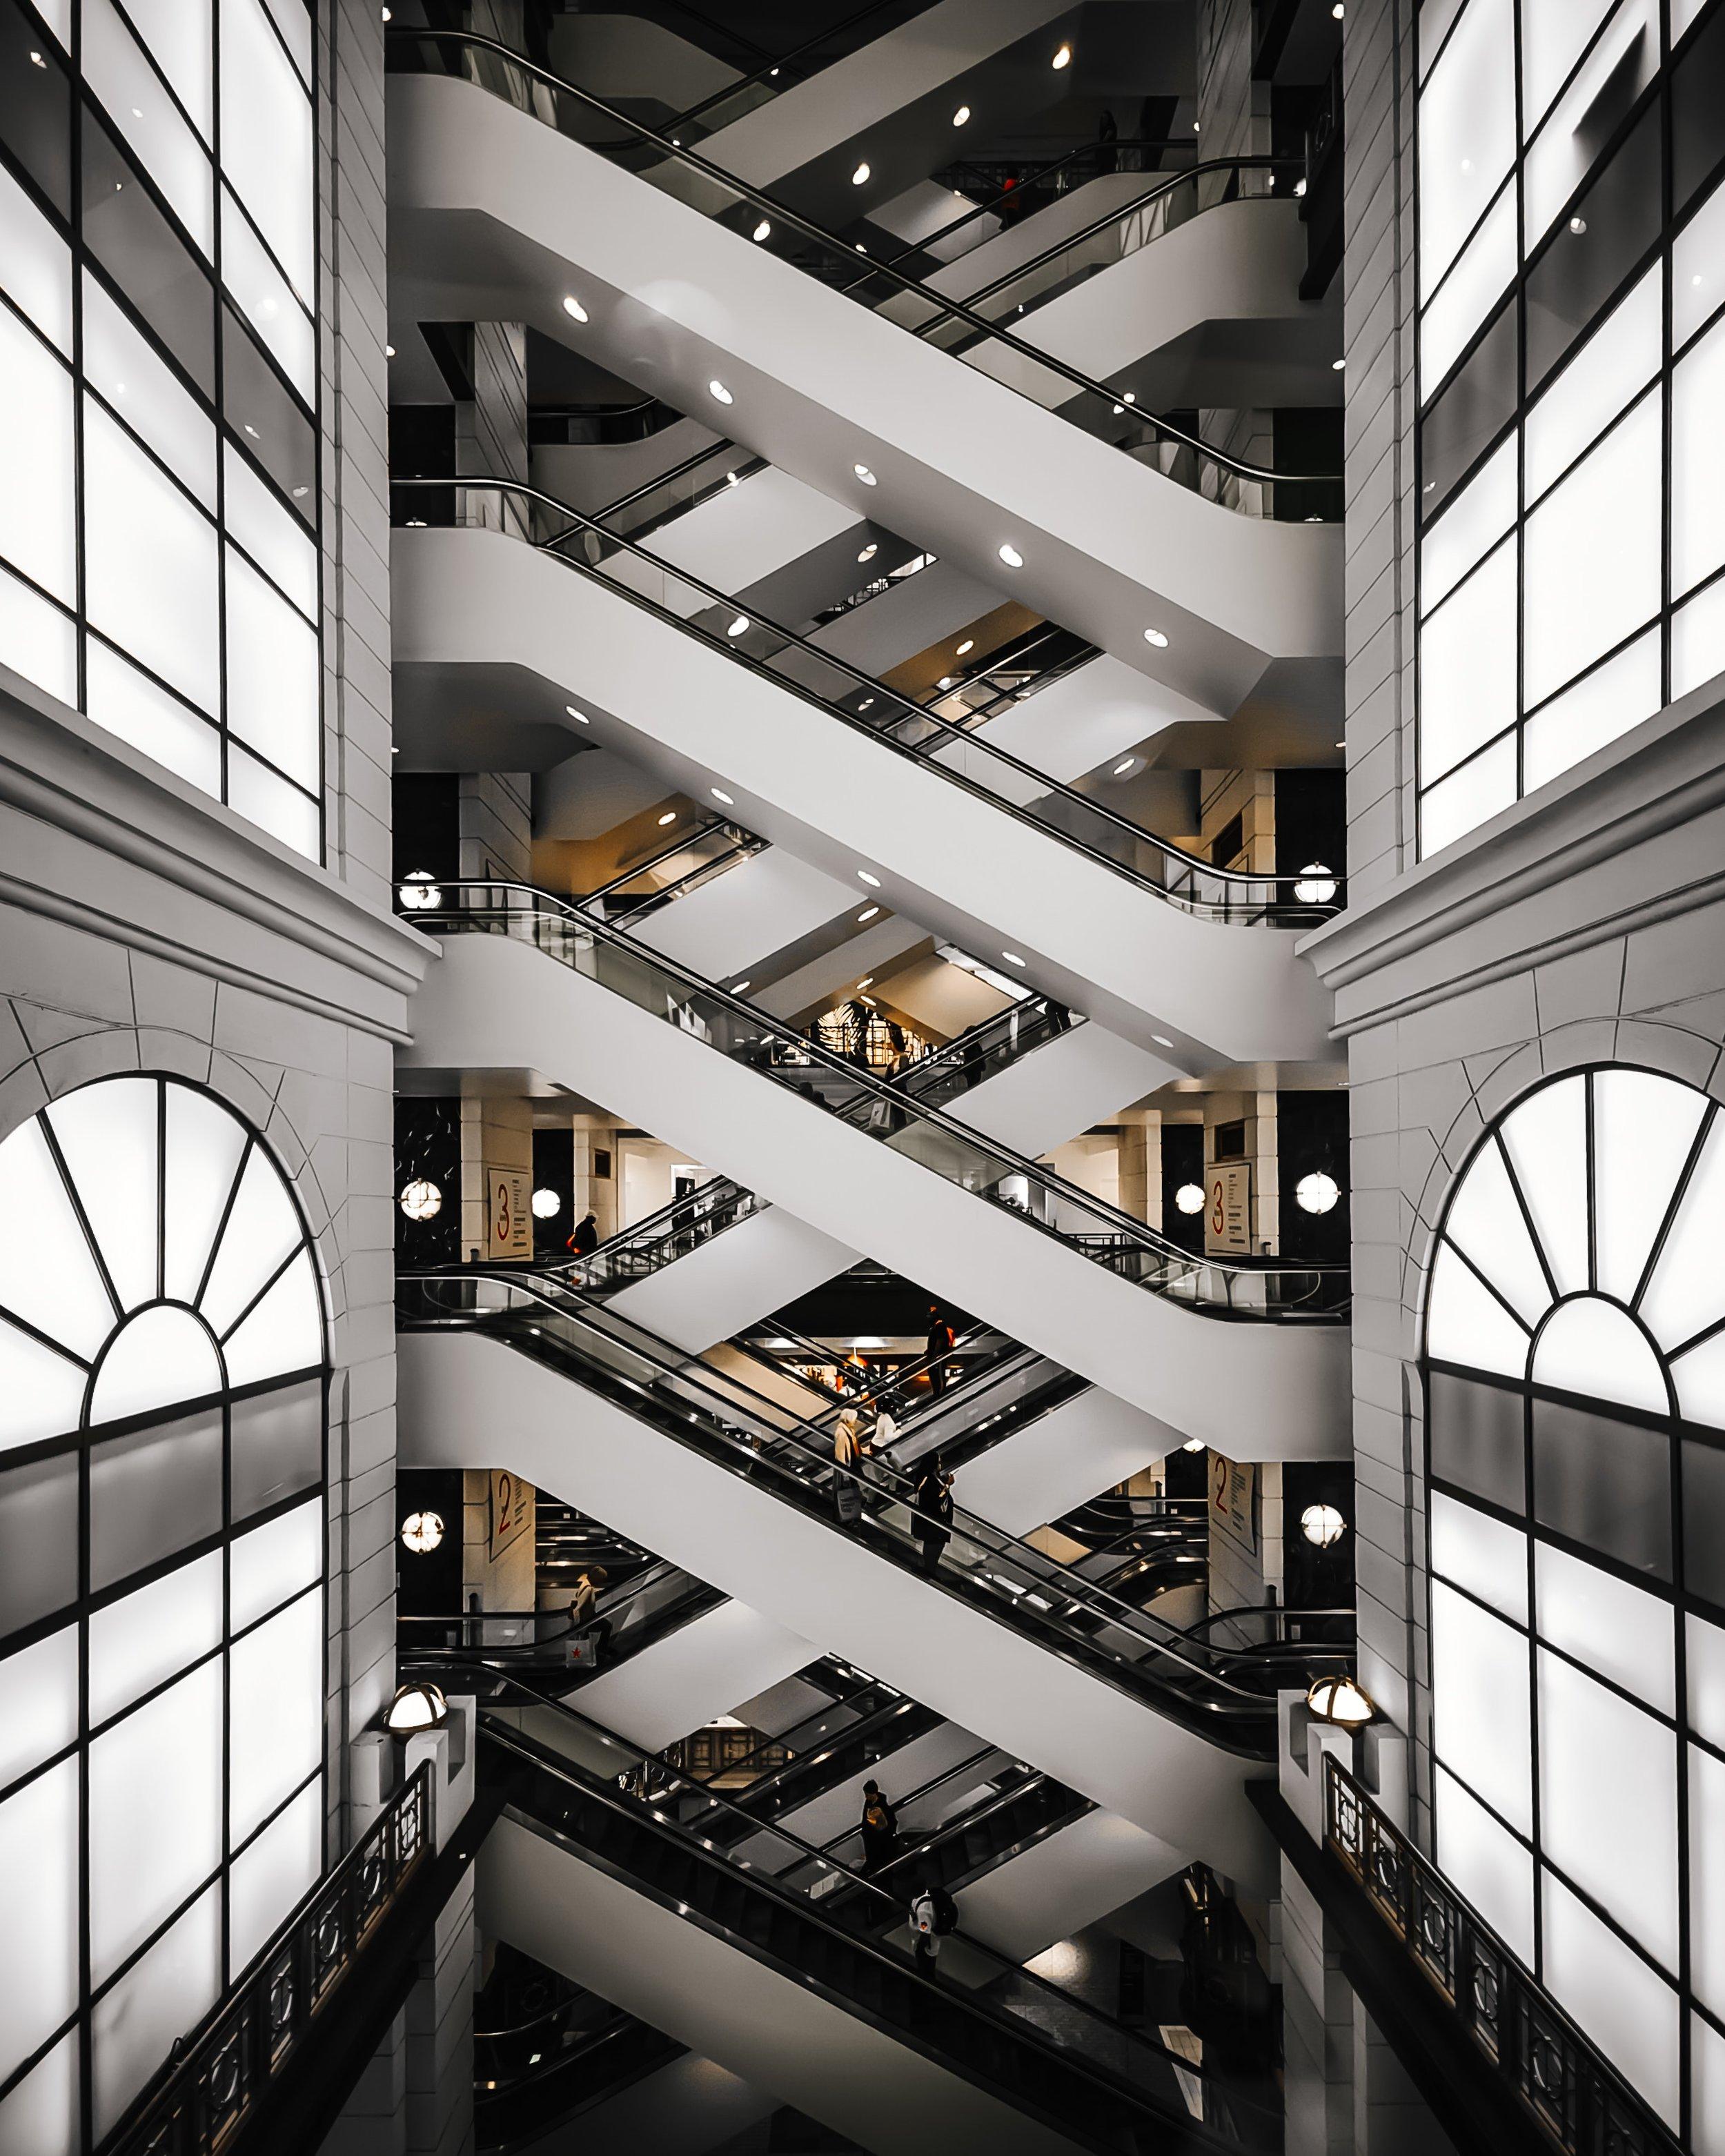 architectural-design-architecture-building-1769356.jpg